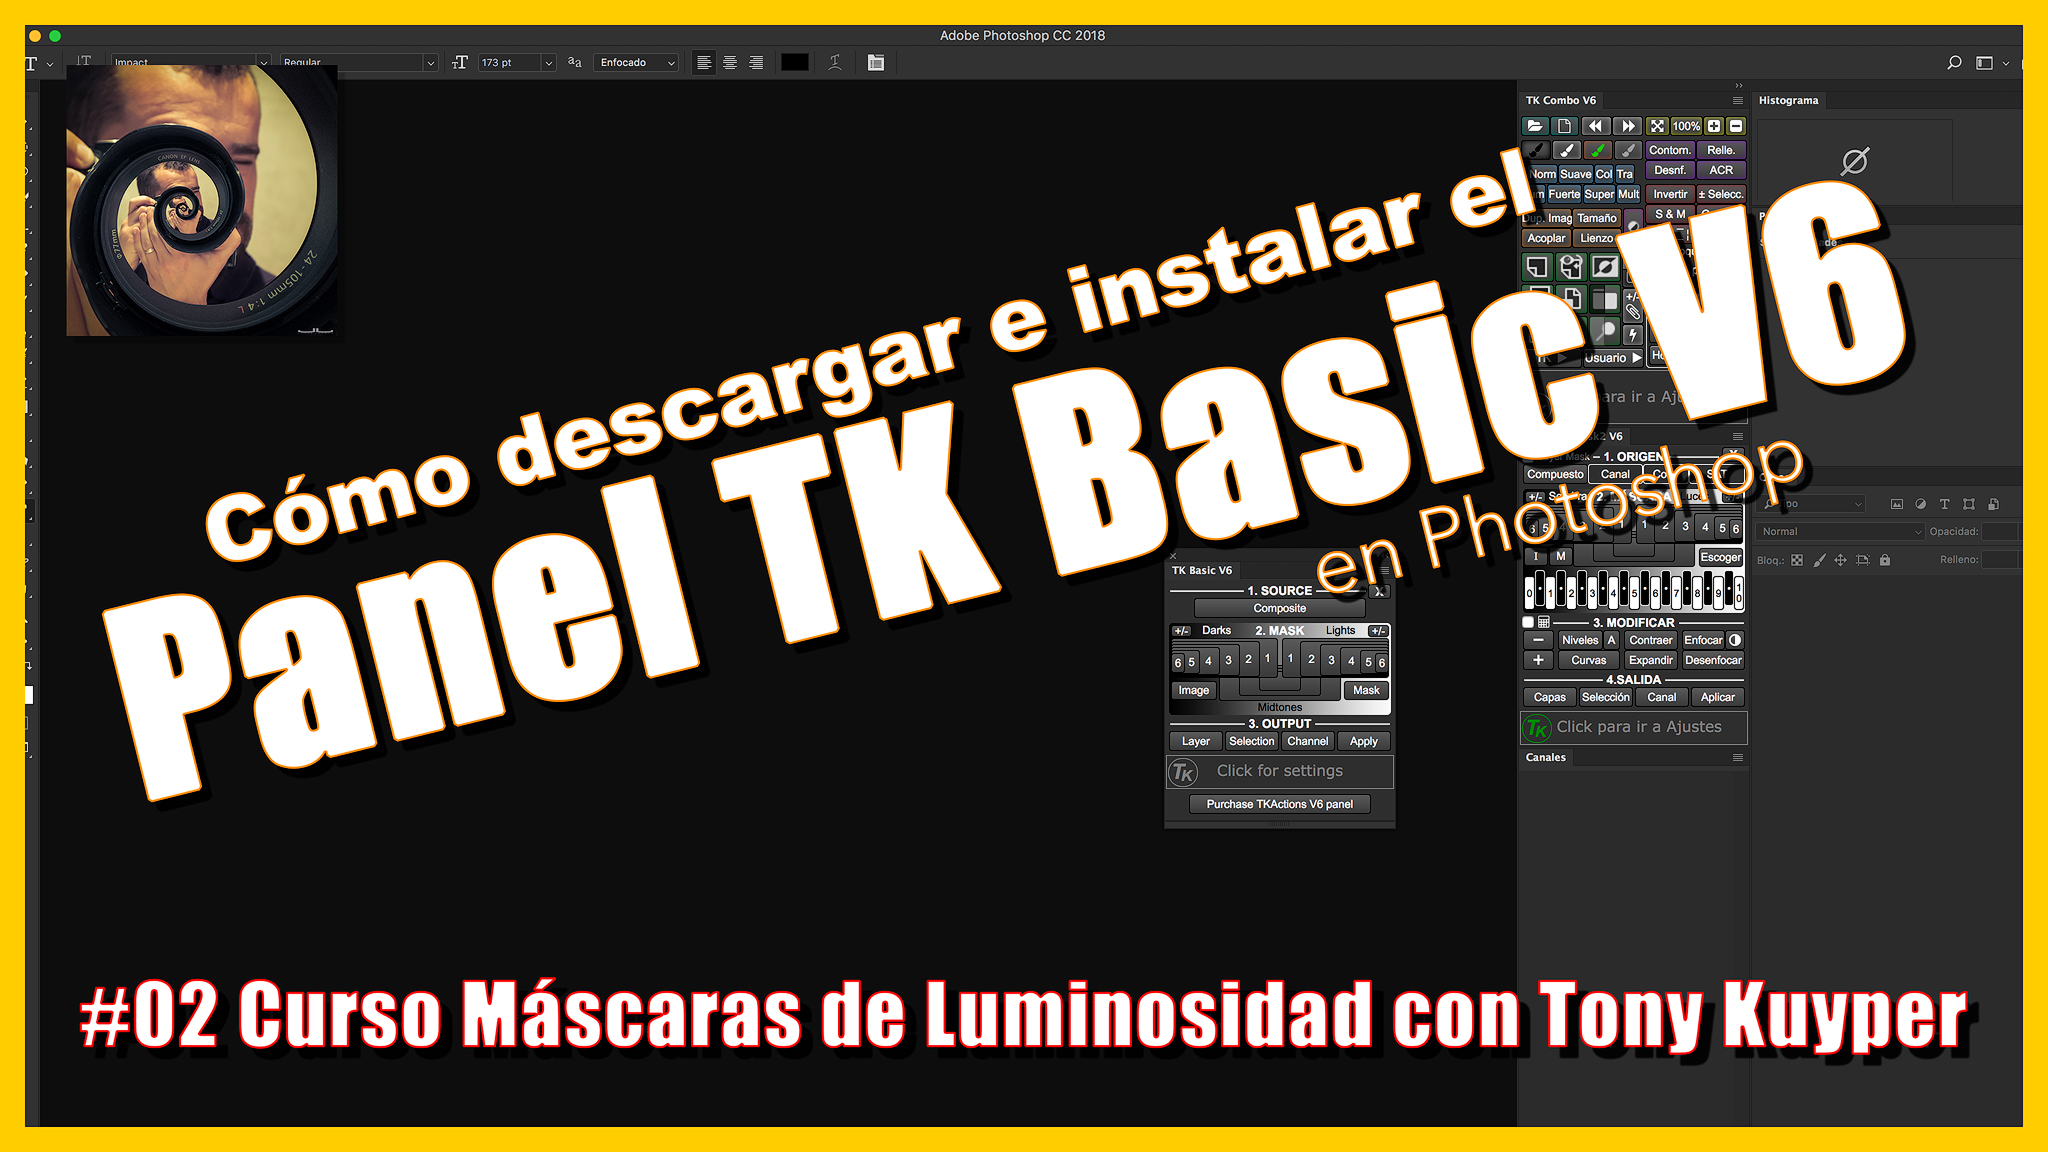 Descargar e instalar el TK Basic V6 - Jorge Lázaro